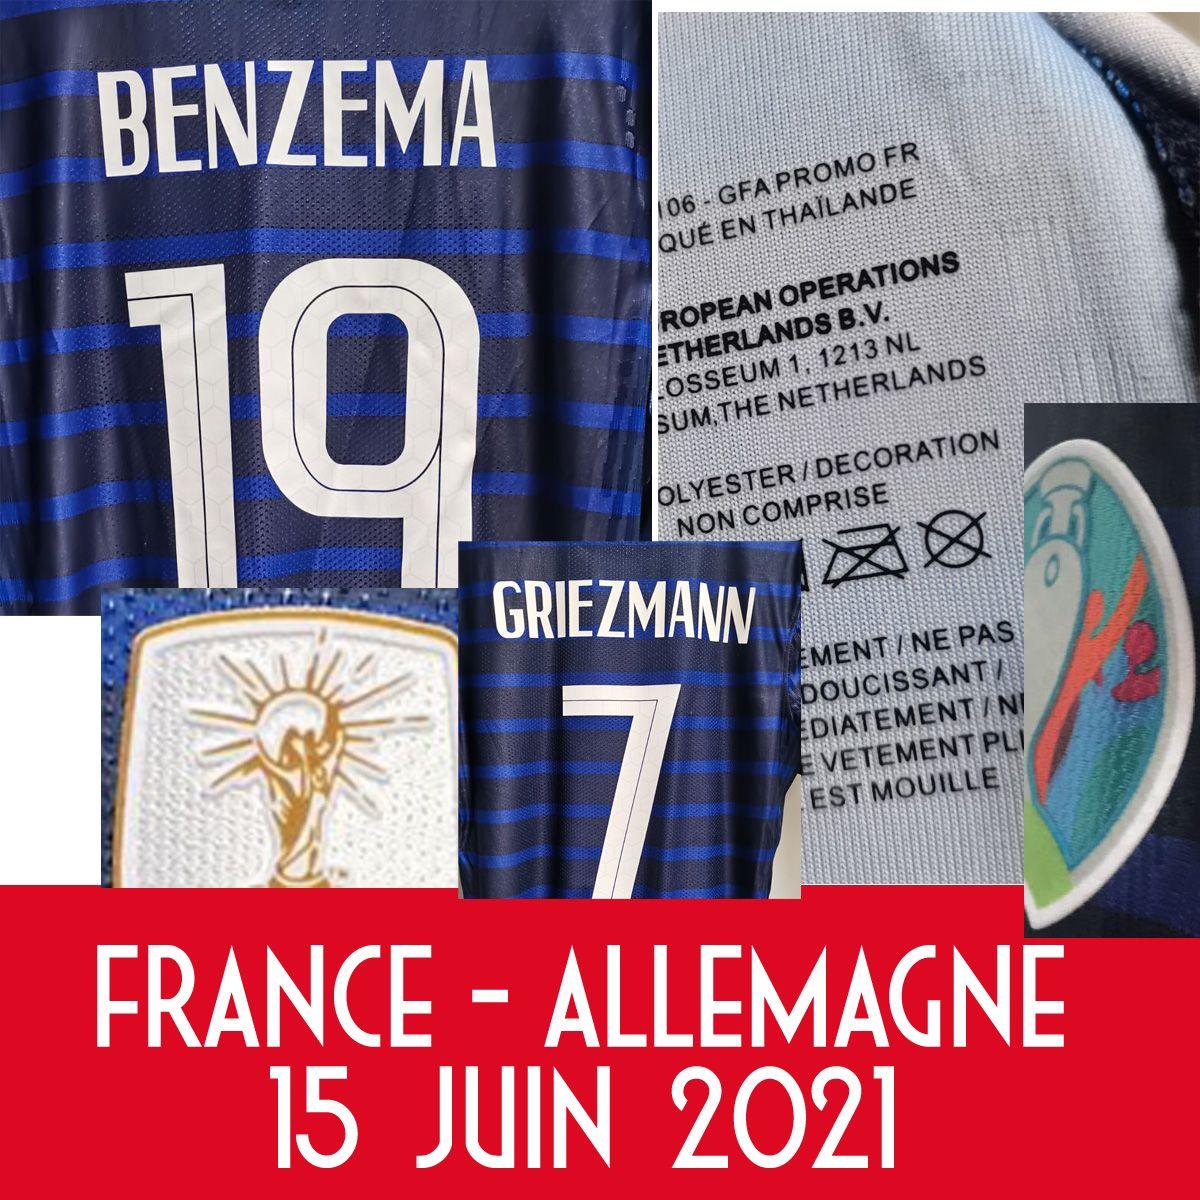 American College Football 2021 Match Worn Playe Edição Benzema Maillot vs Allemagne Grisezmann Pogba Kante Giroud com Jogo MatchDetails Jersey